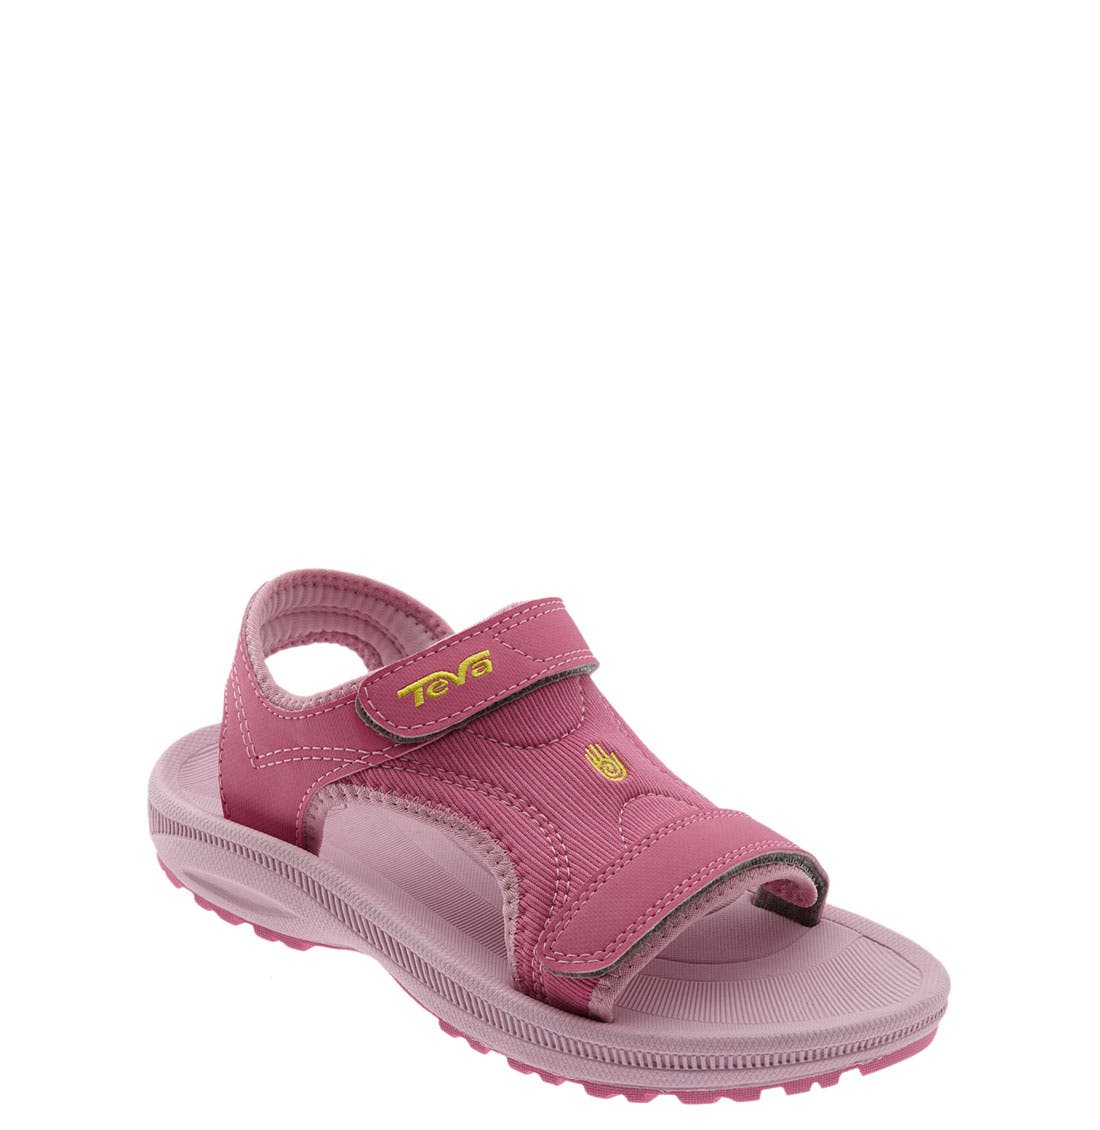 Alternate Image 1 Selected - Teva 'Psyclone' Water Sandal (Toddler, Little Kid & Big Kid)